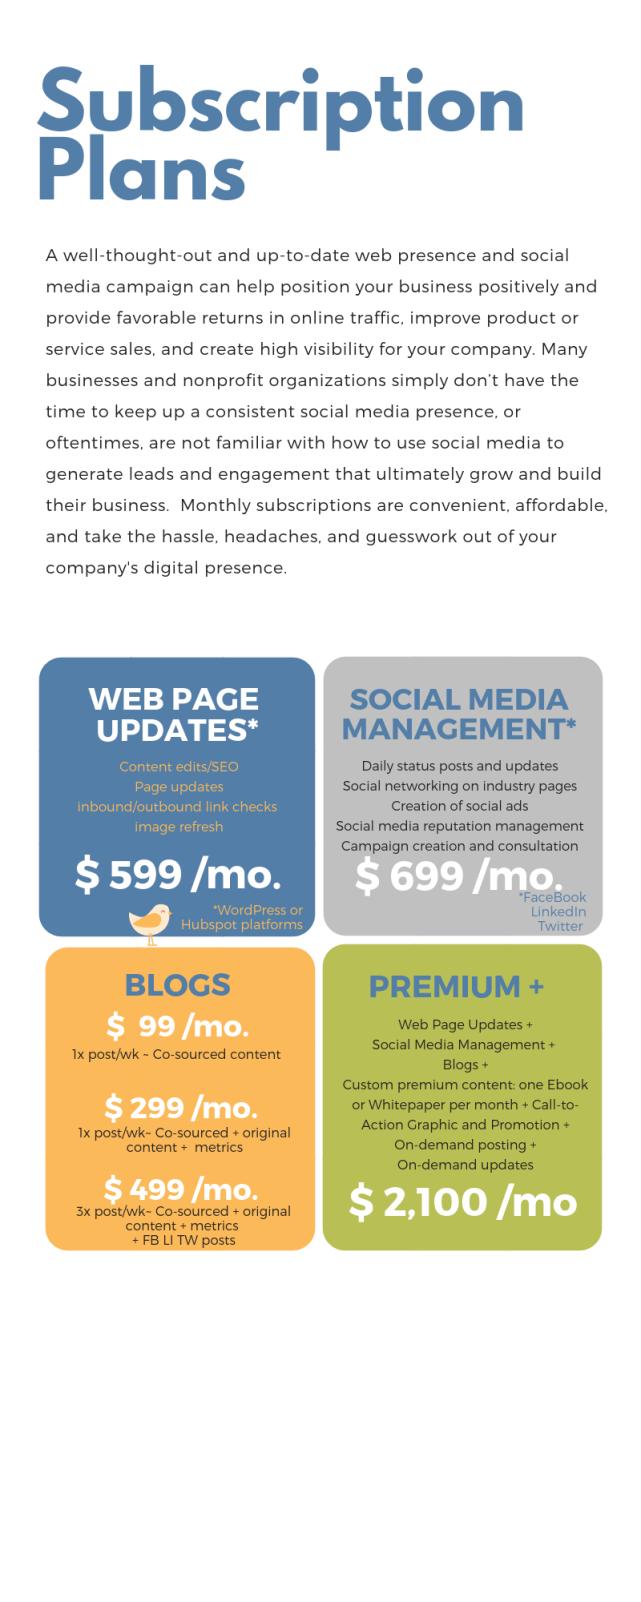 Subsriptions Plans Social Media